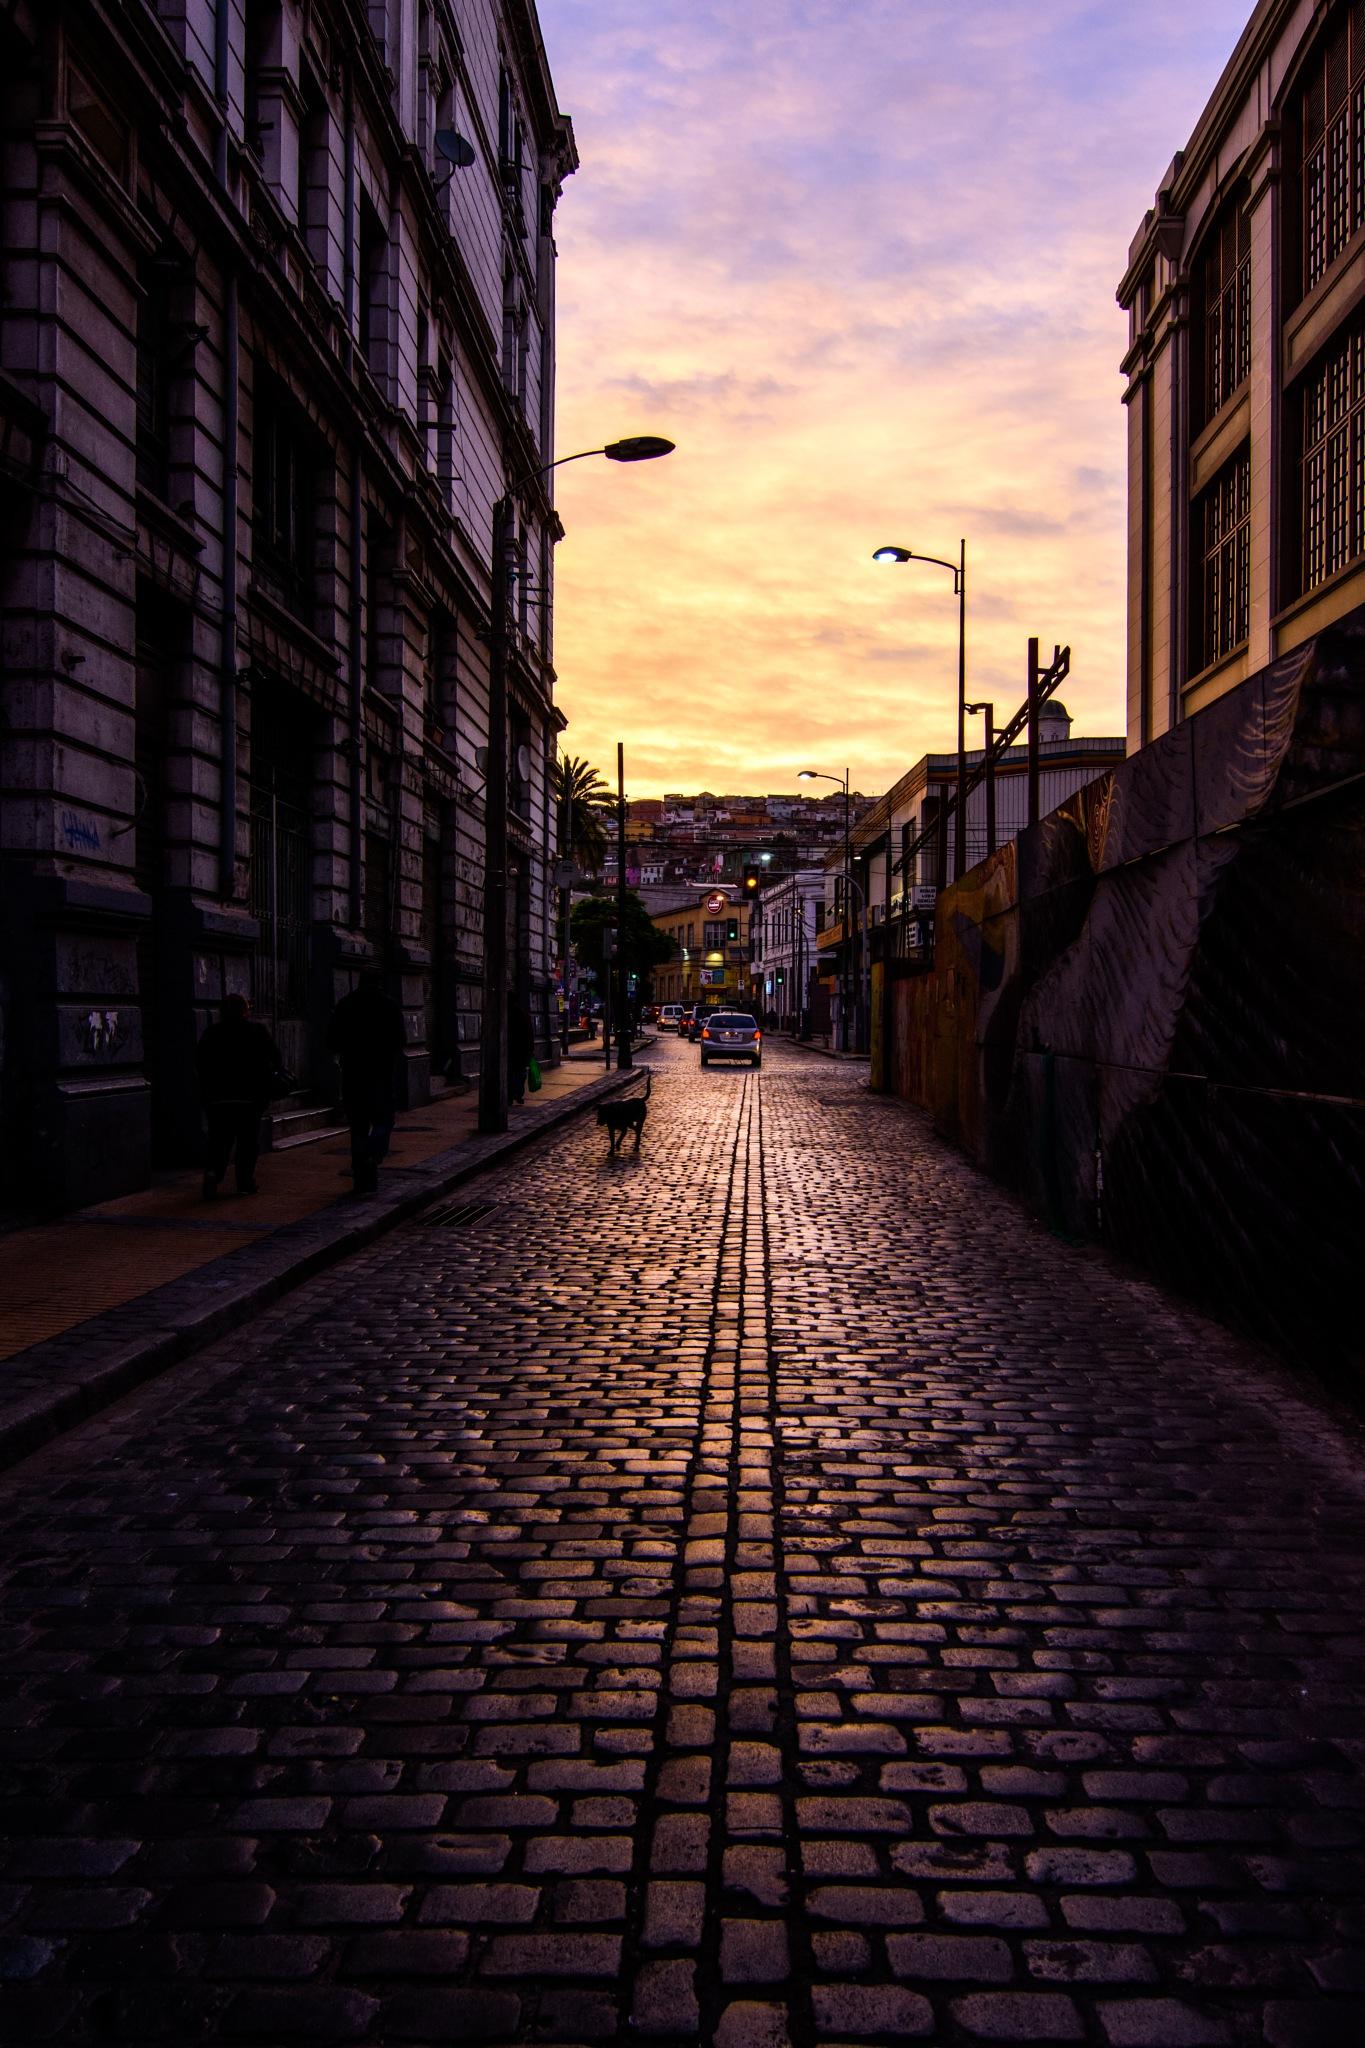 Valparaiso sunset by Michel Droguett C